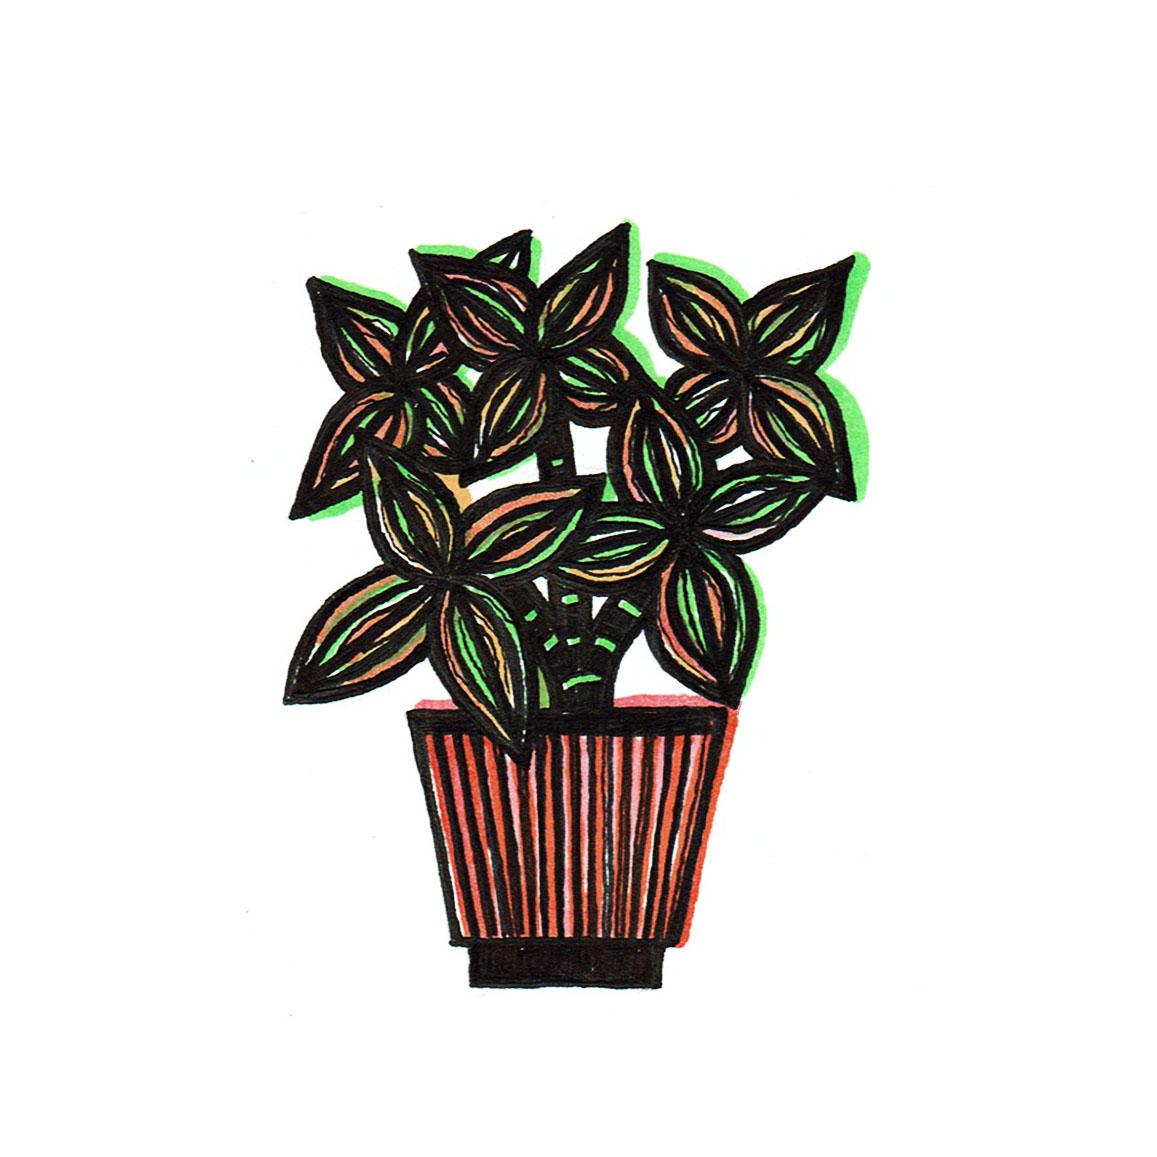 JAQUELINE STORM groenplant 4